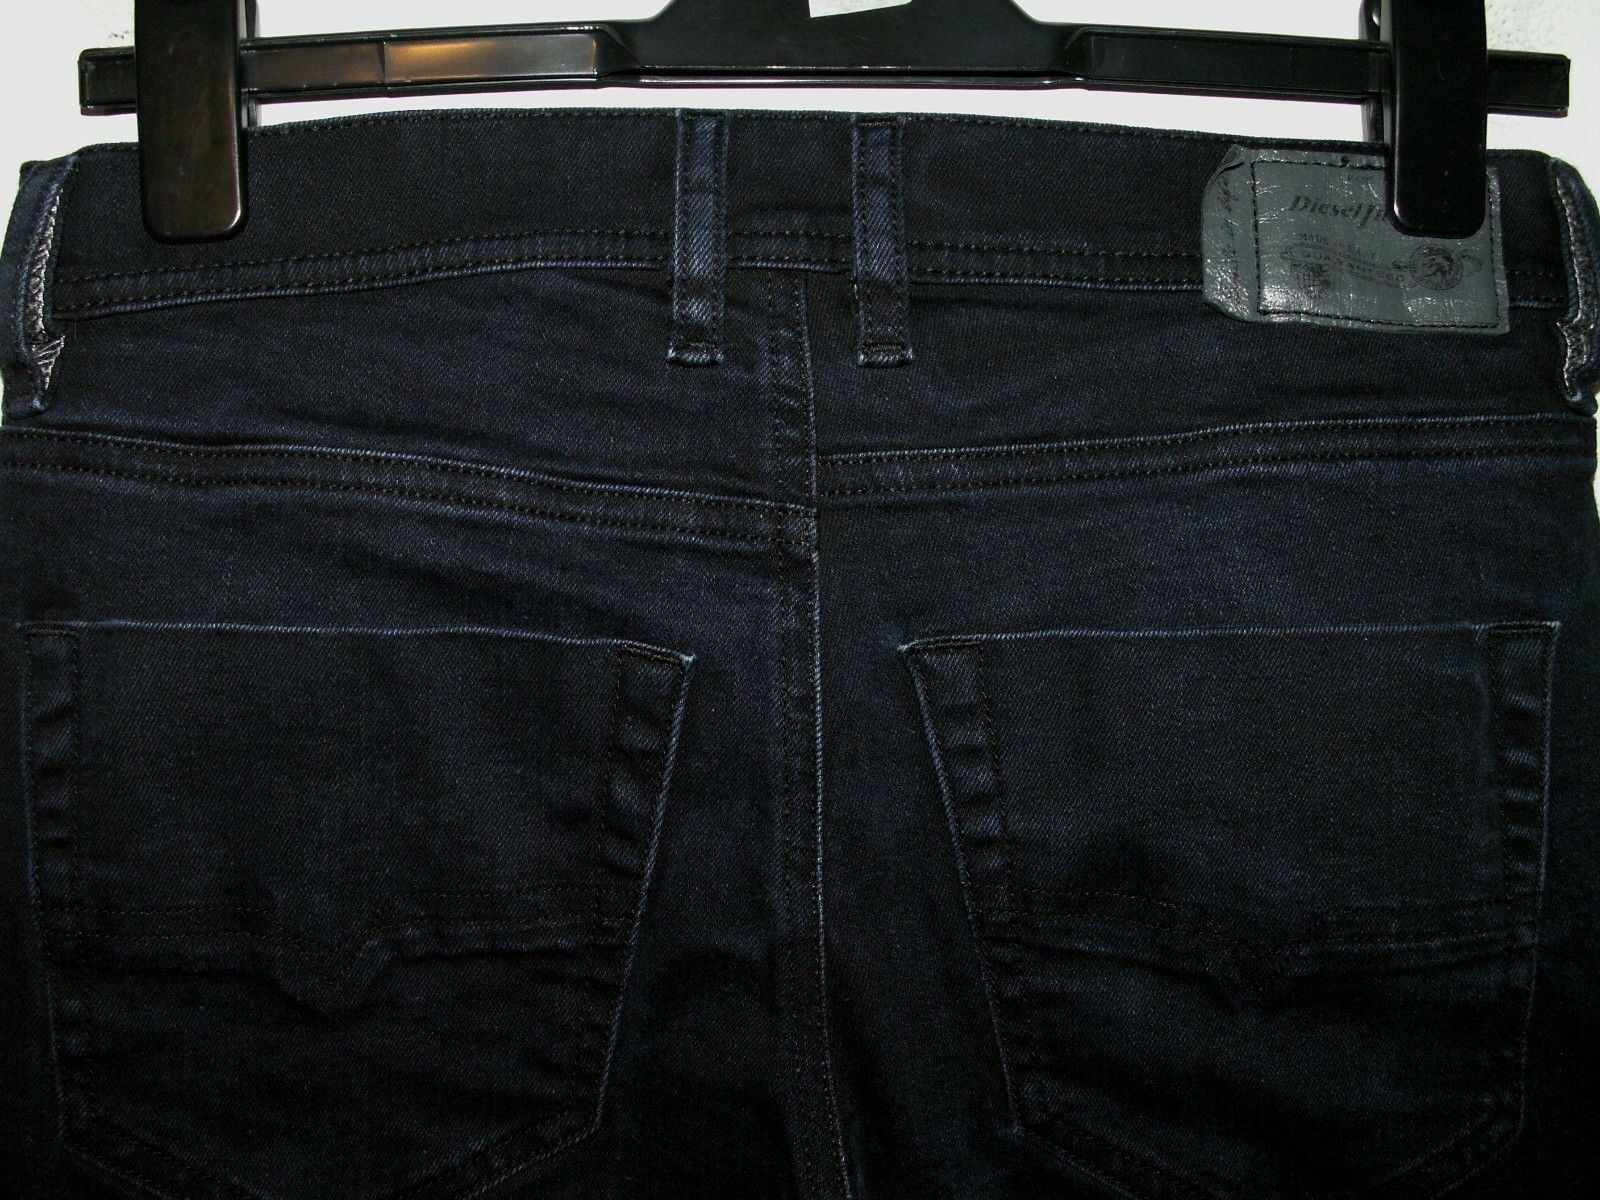 DIESEL TEPPHAR SLIM-CARROT FIT JEANS 0RF84 STRETCH W28 L30 (5006)  | Angemessener Preis  | Shop  | Mode-Muster